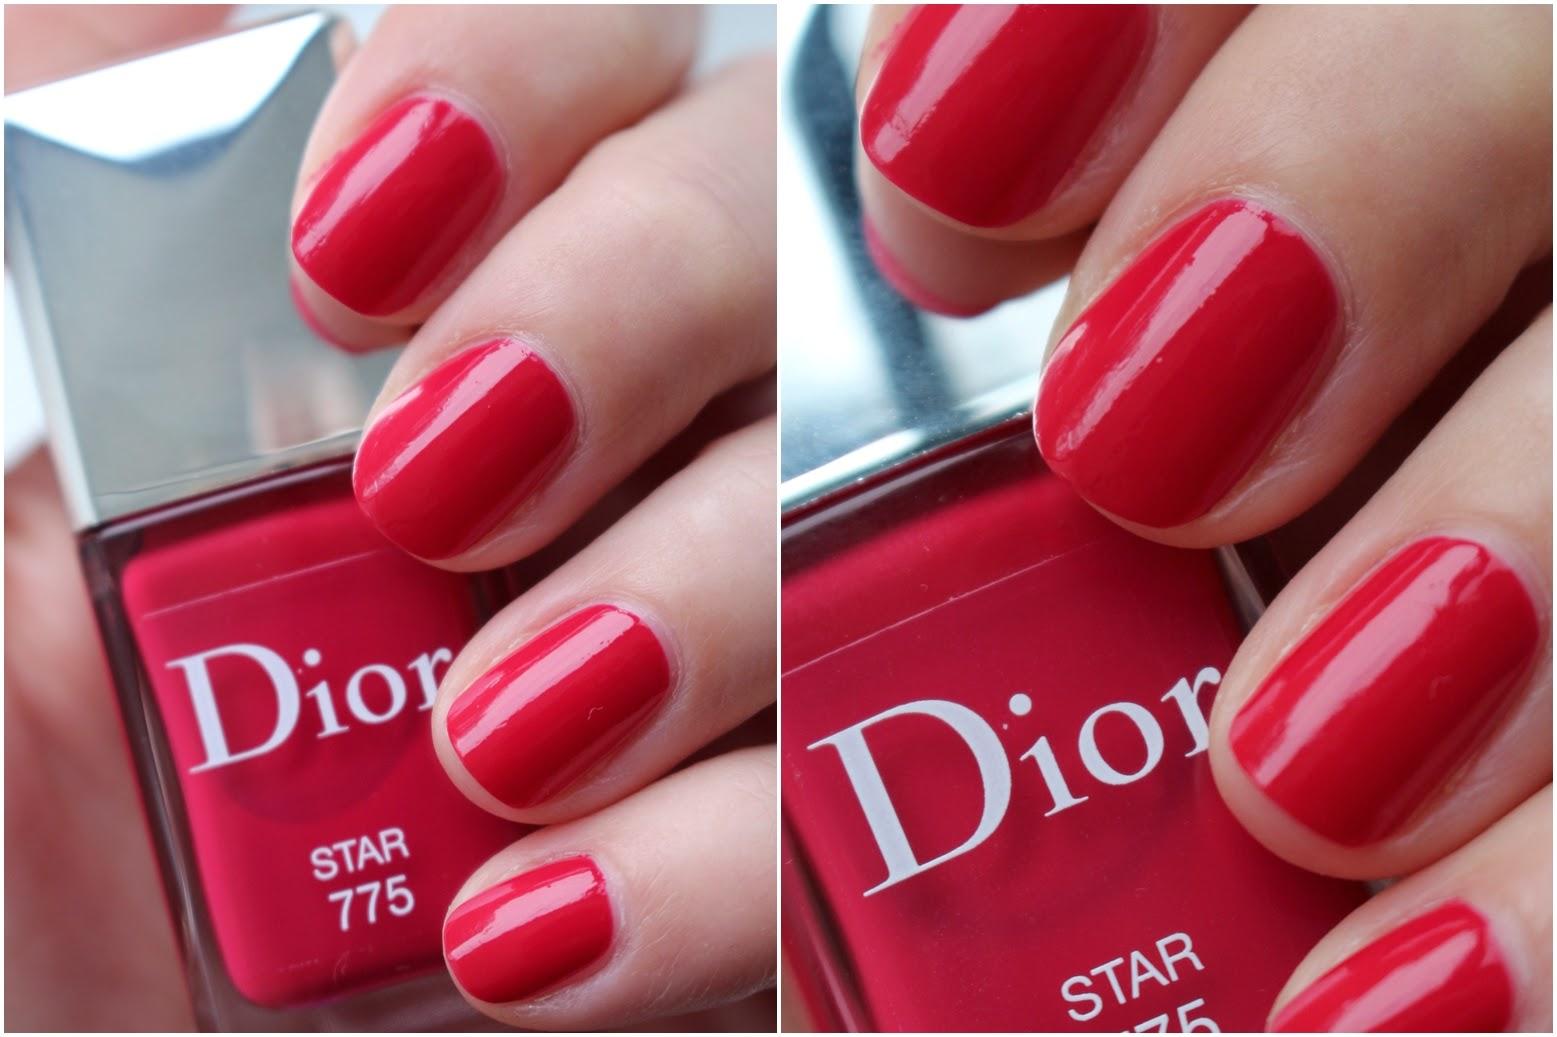 Dior Vernis 775 Star